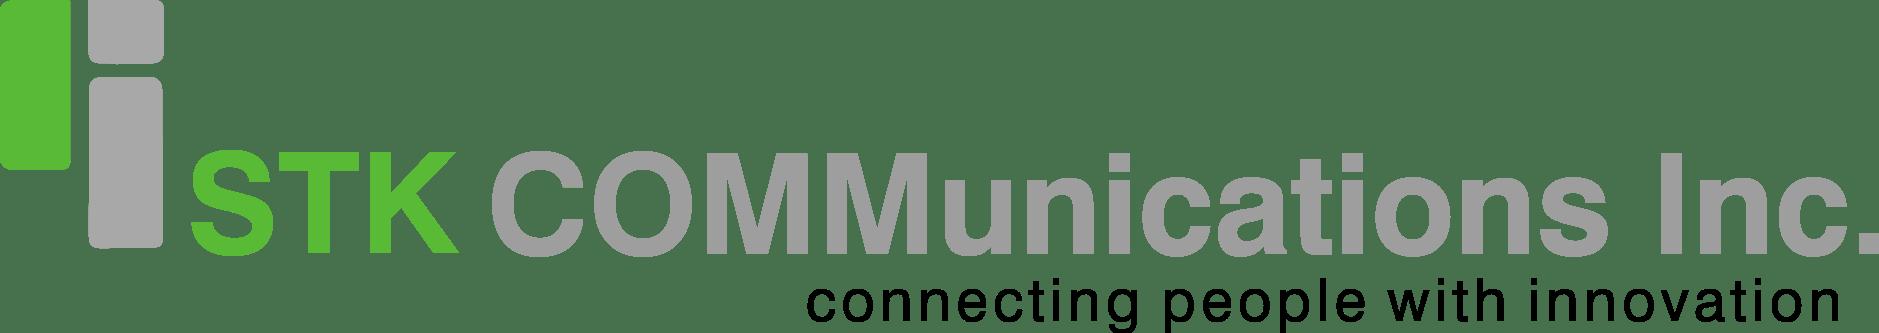 STK Communications